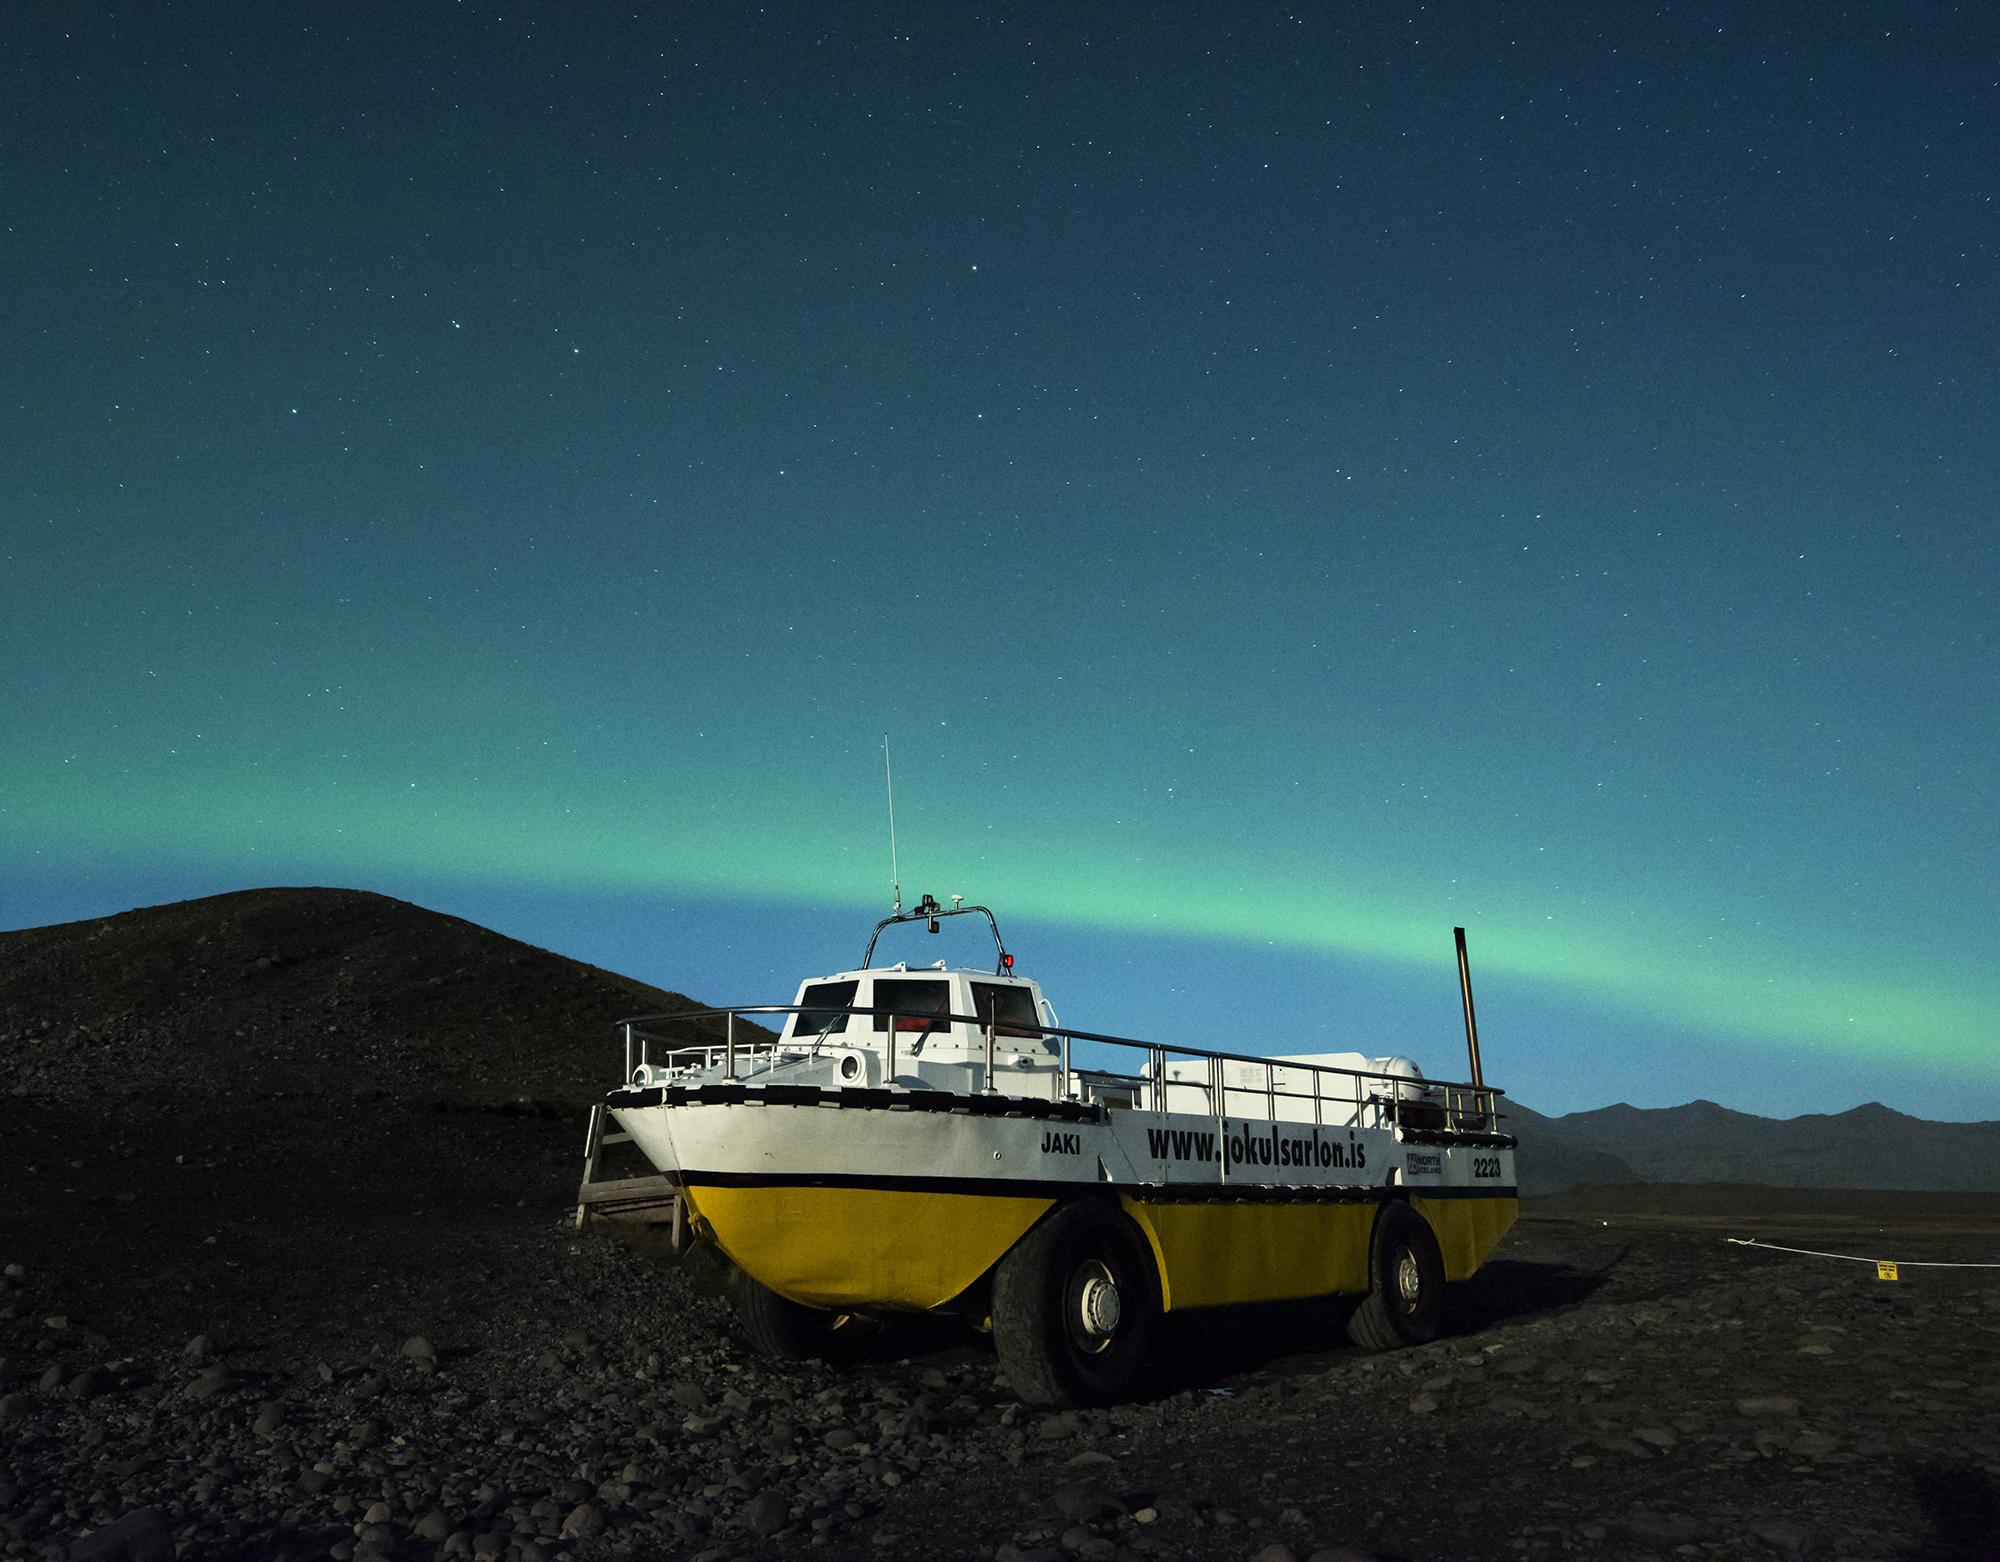 jokulsarlon glacier boat with northern lights